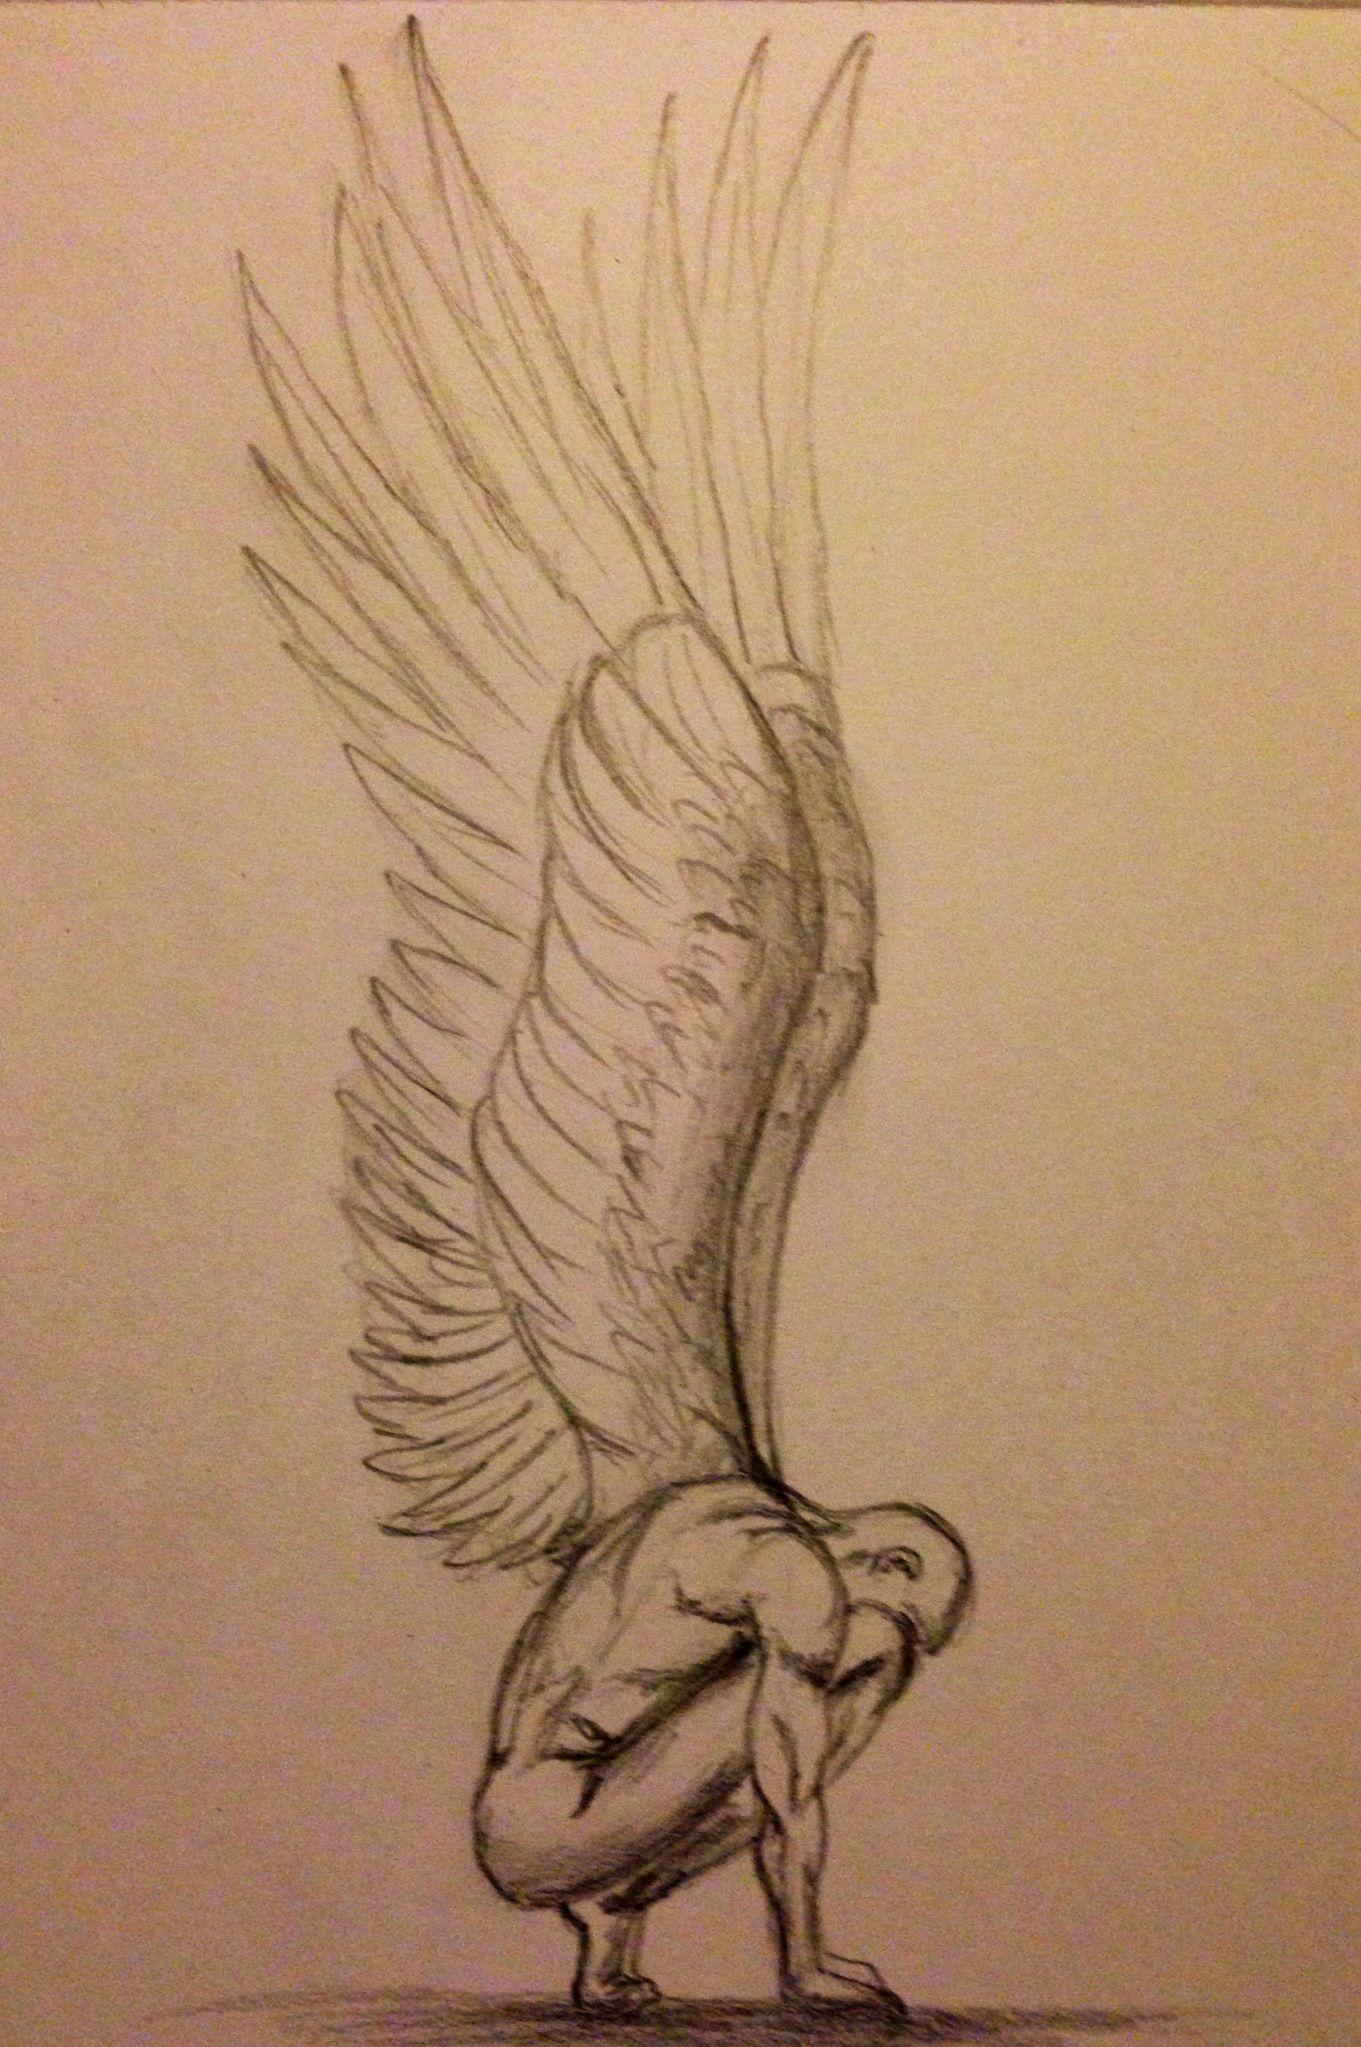 angel sketch tattoo ideas pinterest arte dibujos and dibujos